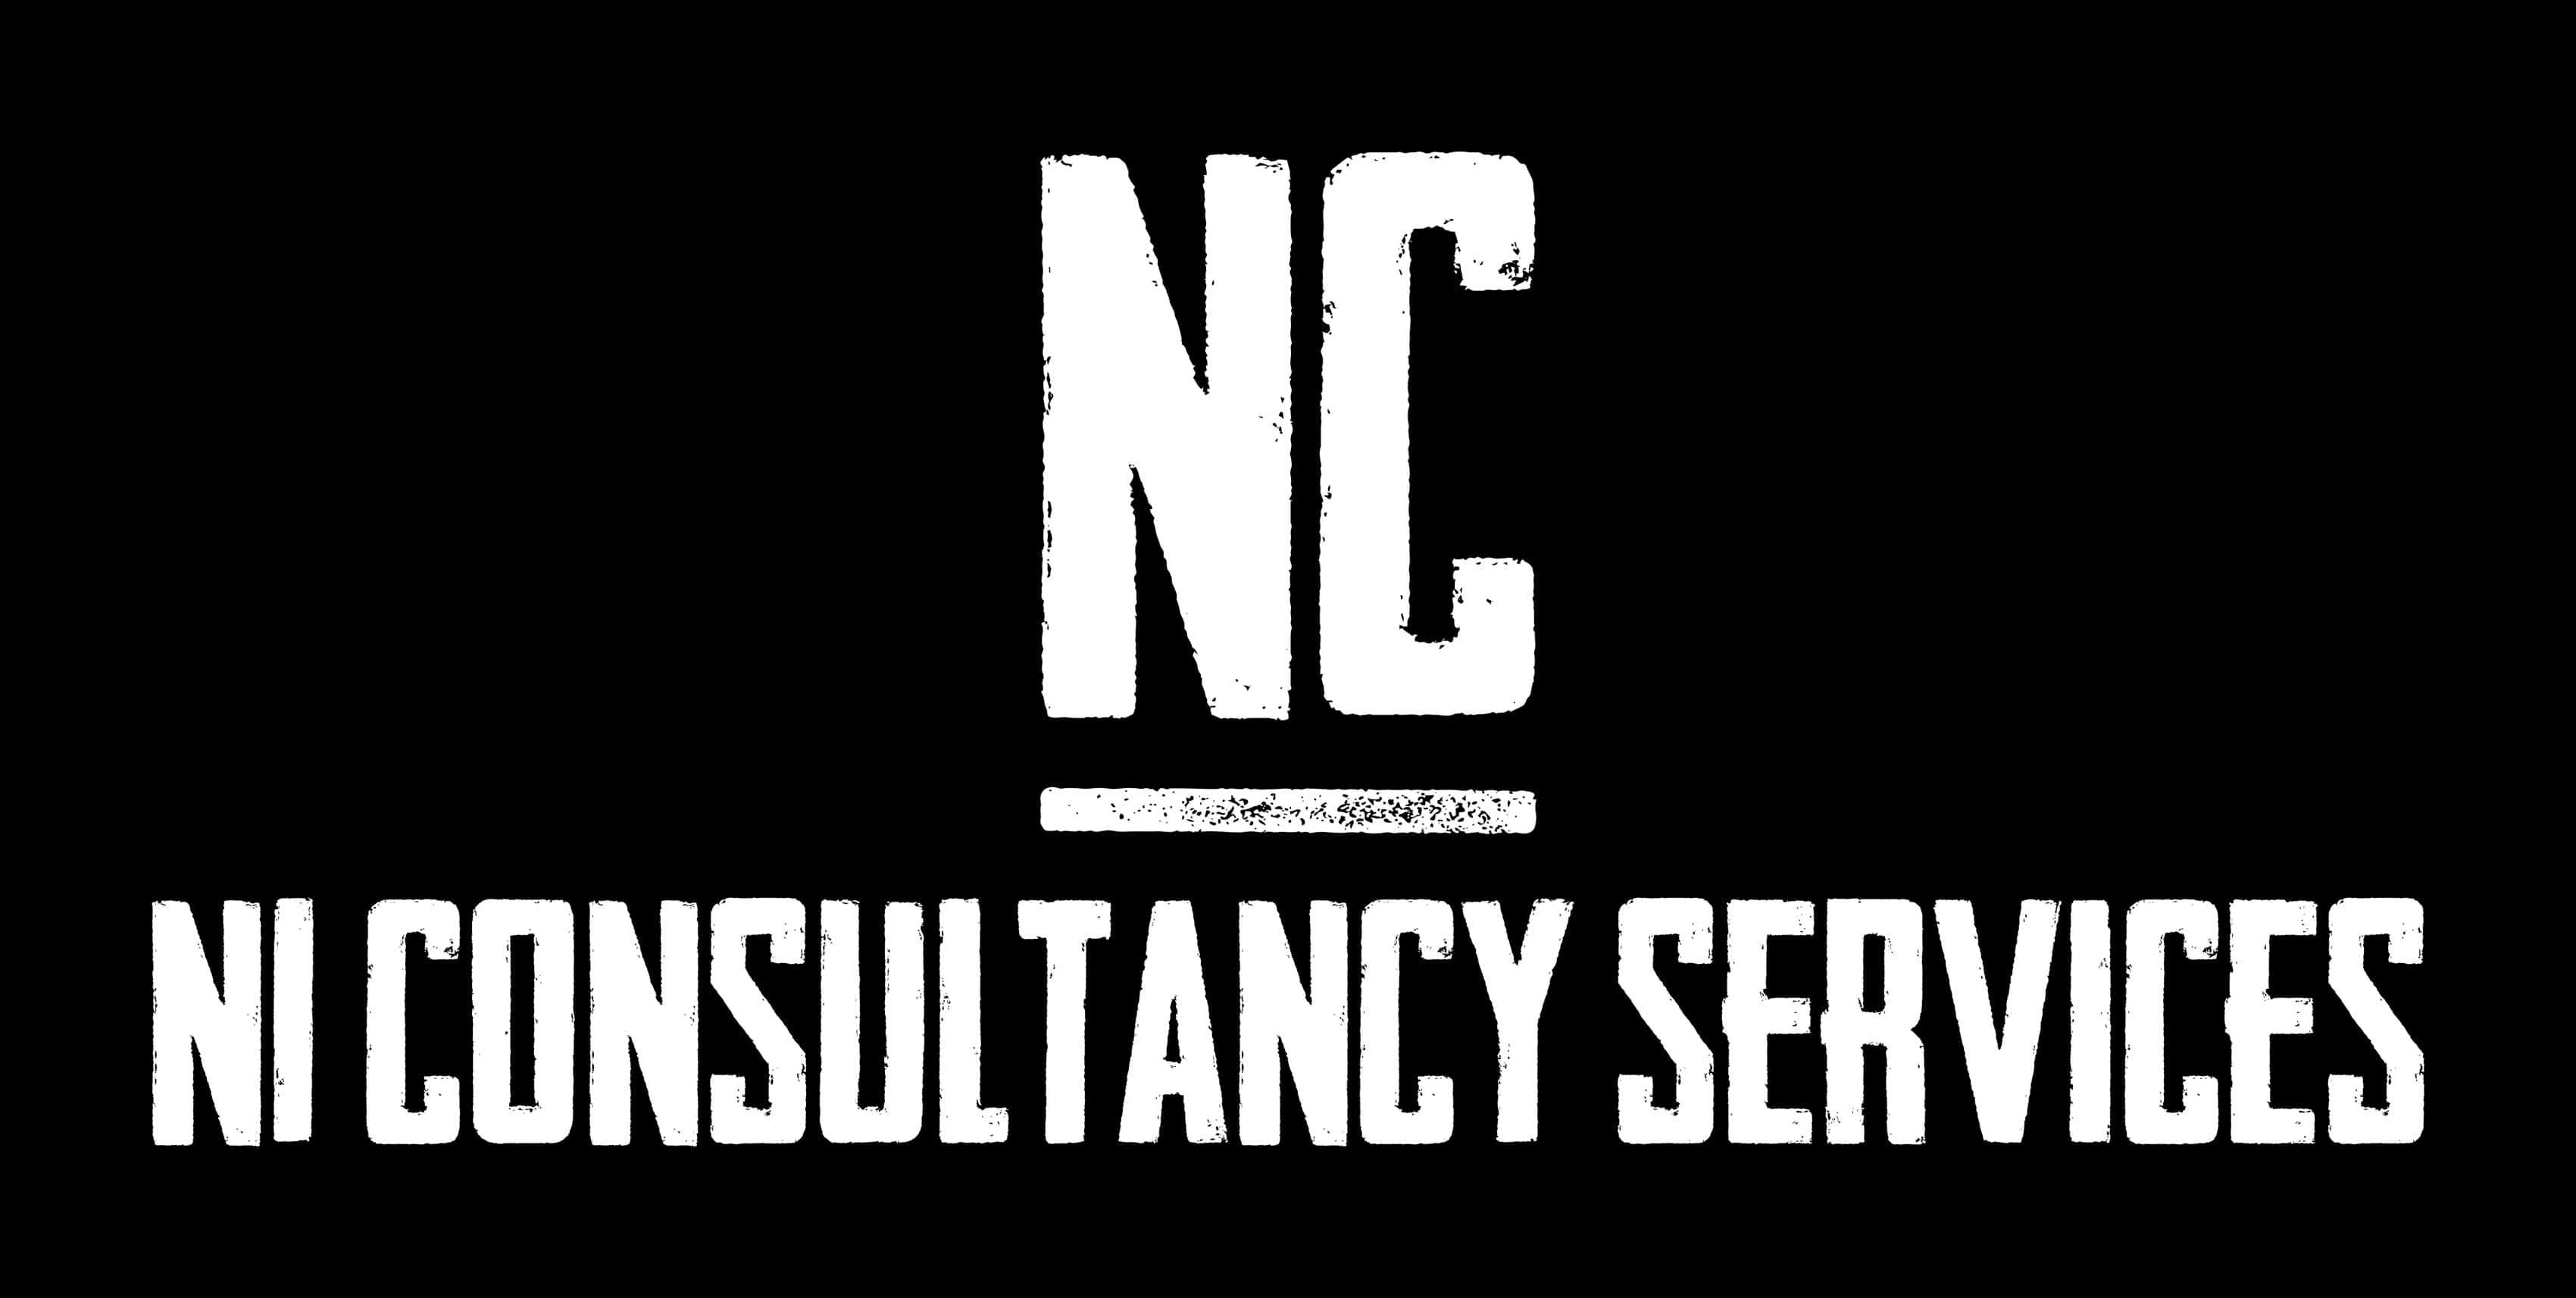 N1 Consultancy Services Ltd logo